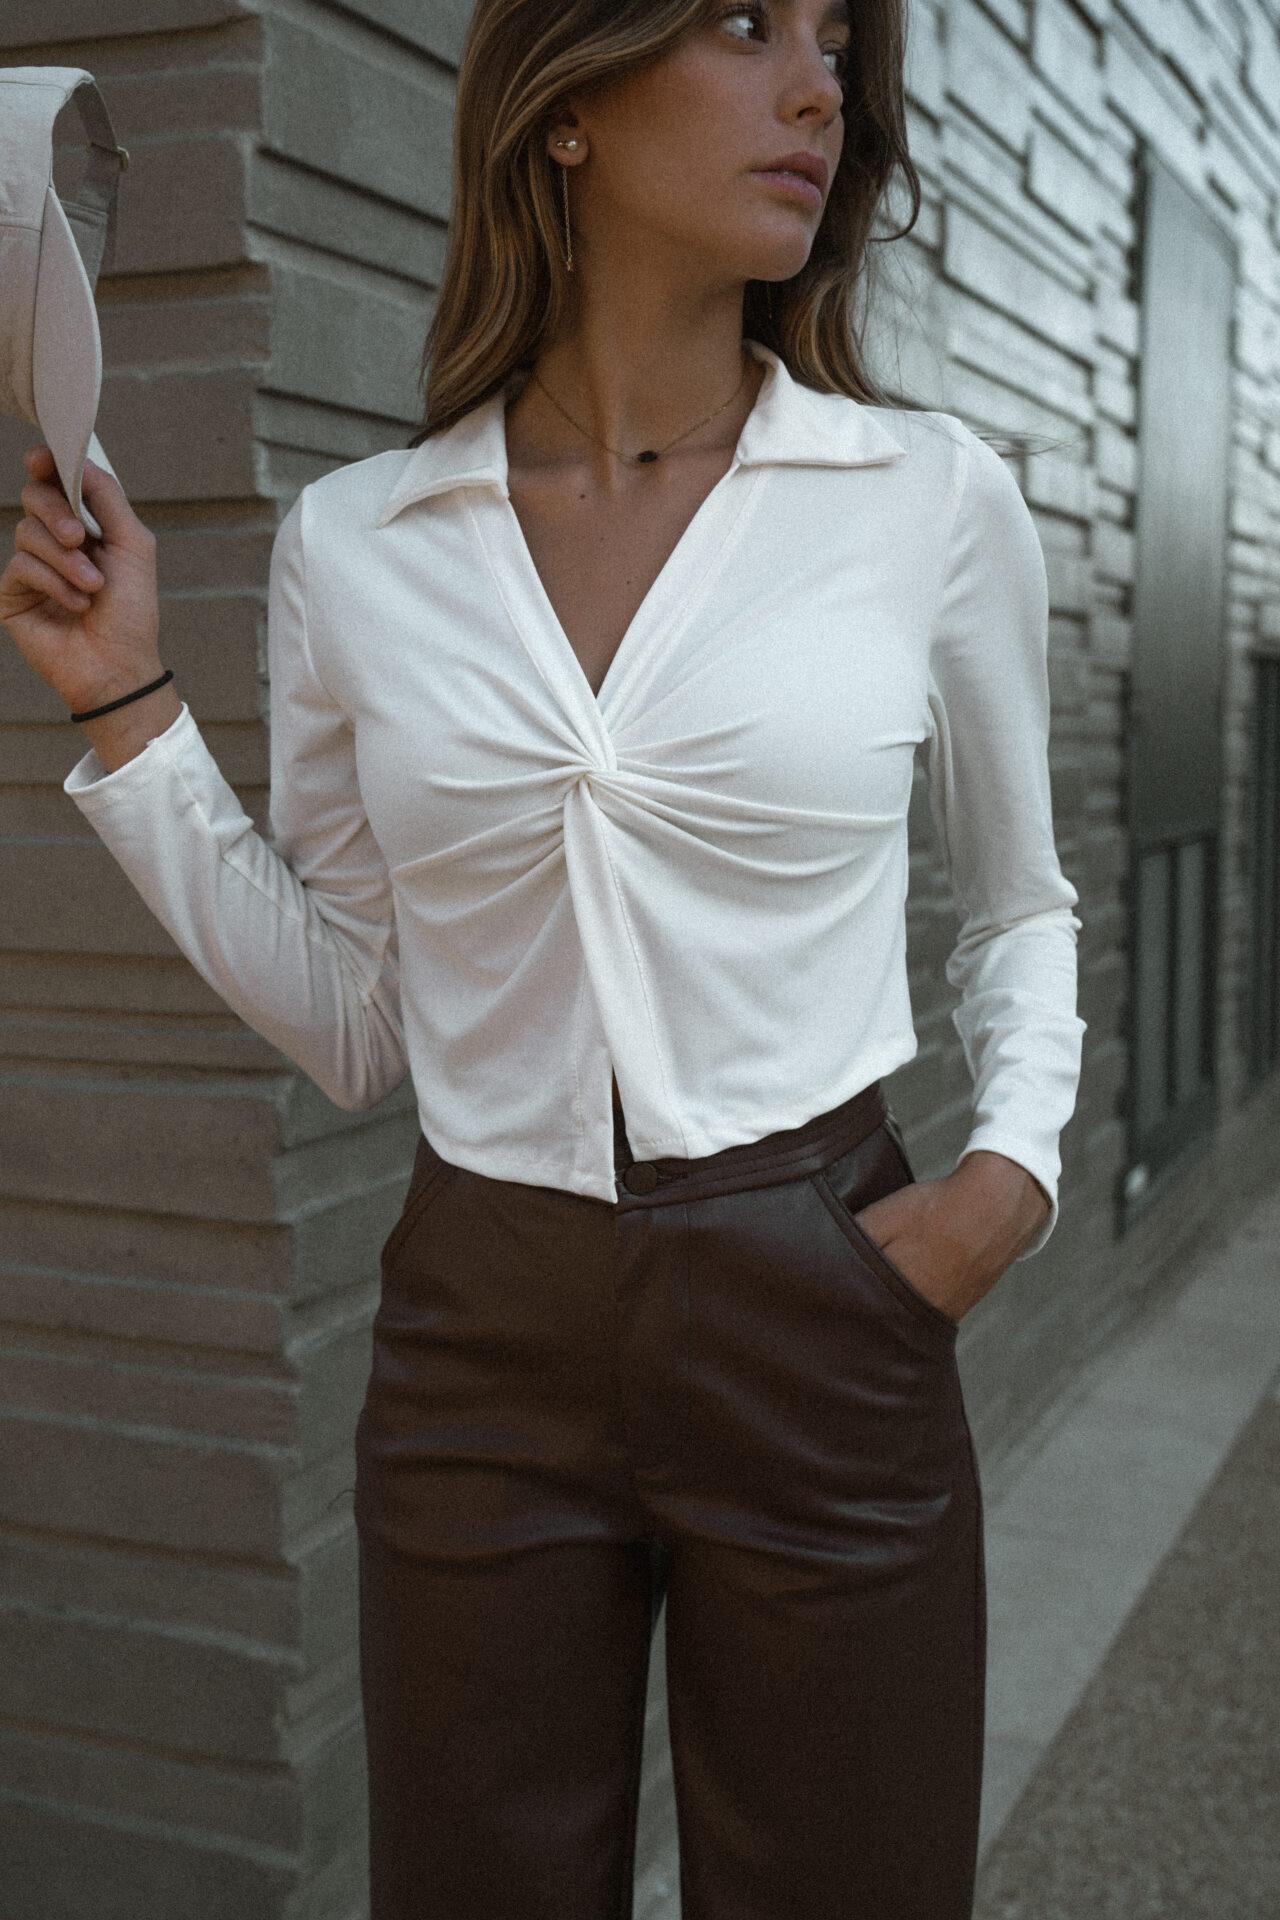 top-chemise-blanc-casquette-pantalon-simili-marron-femme-gisette-store (4)